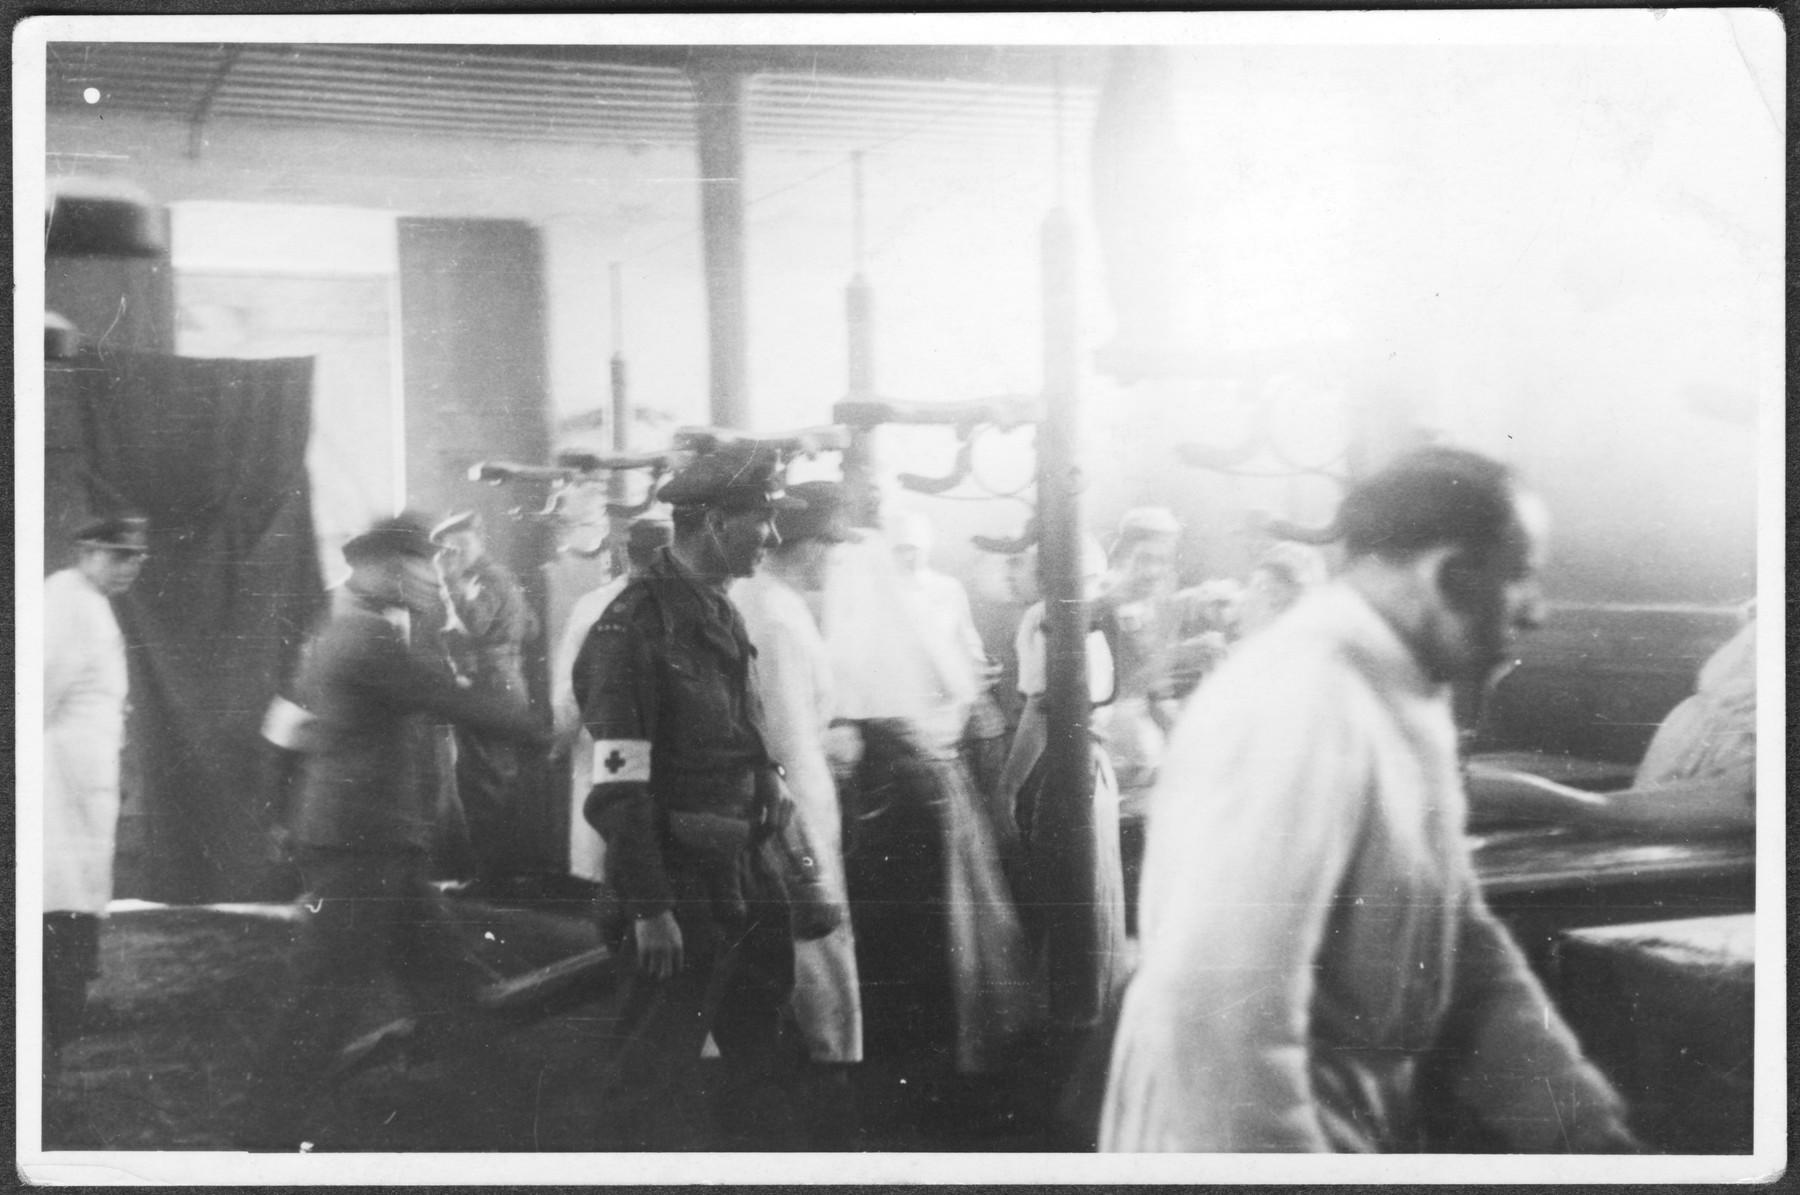 British medical personnel at work in the barracks established for washing and disinfecting survivors in Bergen-Belsen.